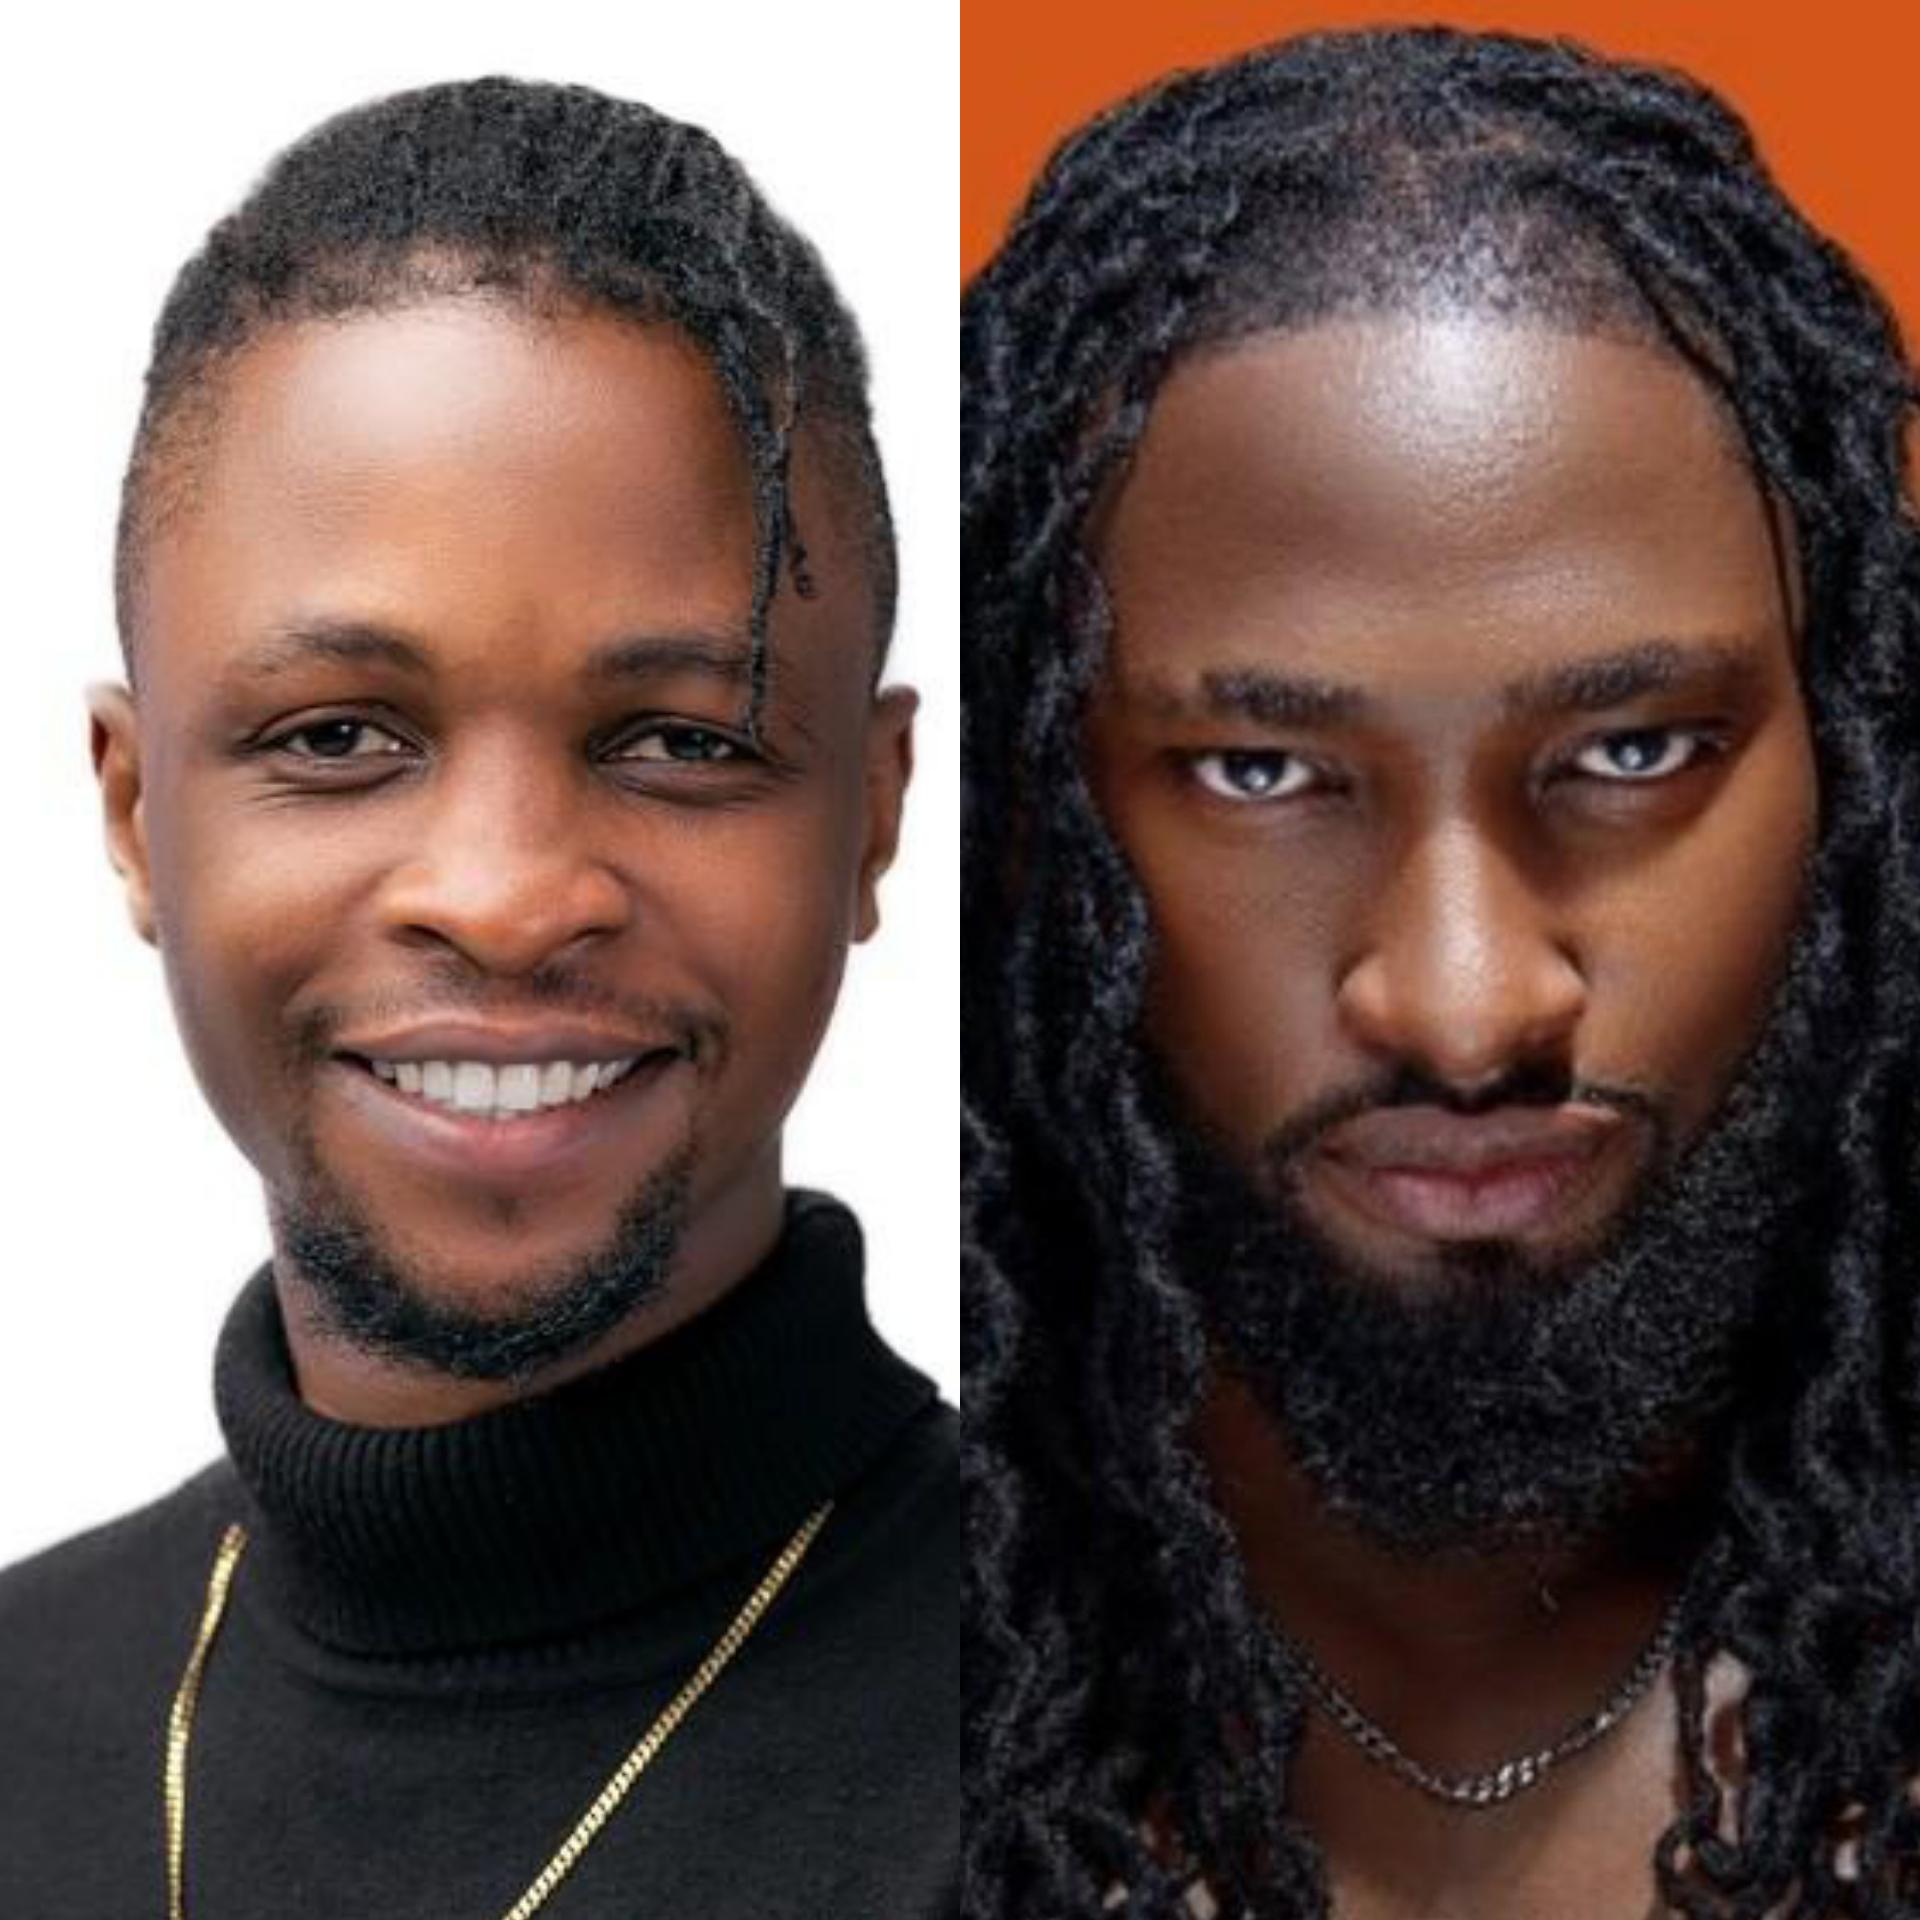 BBNaija: Laycon will emerge the winner because he is the housemate followed by Grace – Uti Nwachukwu predicts